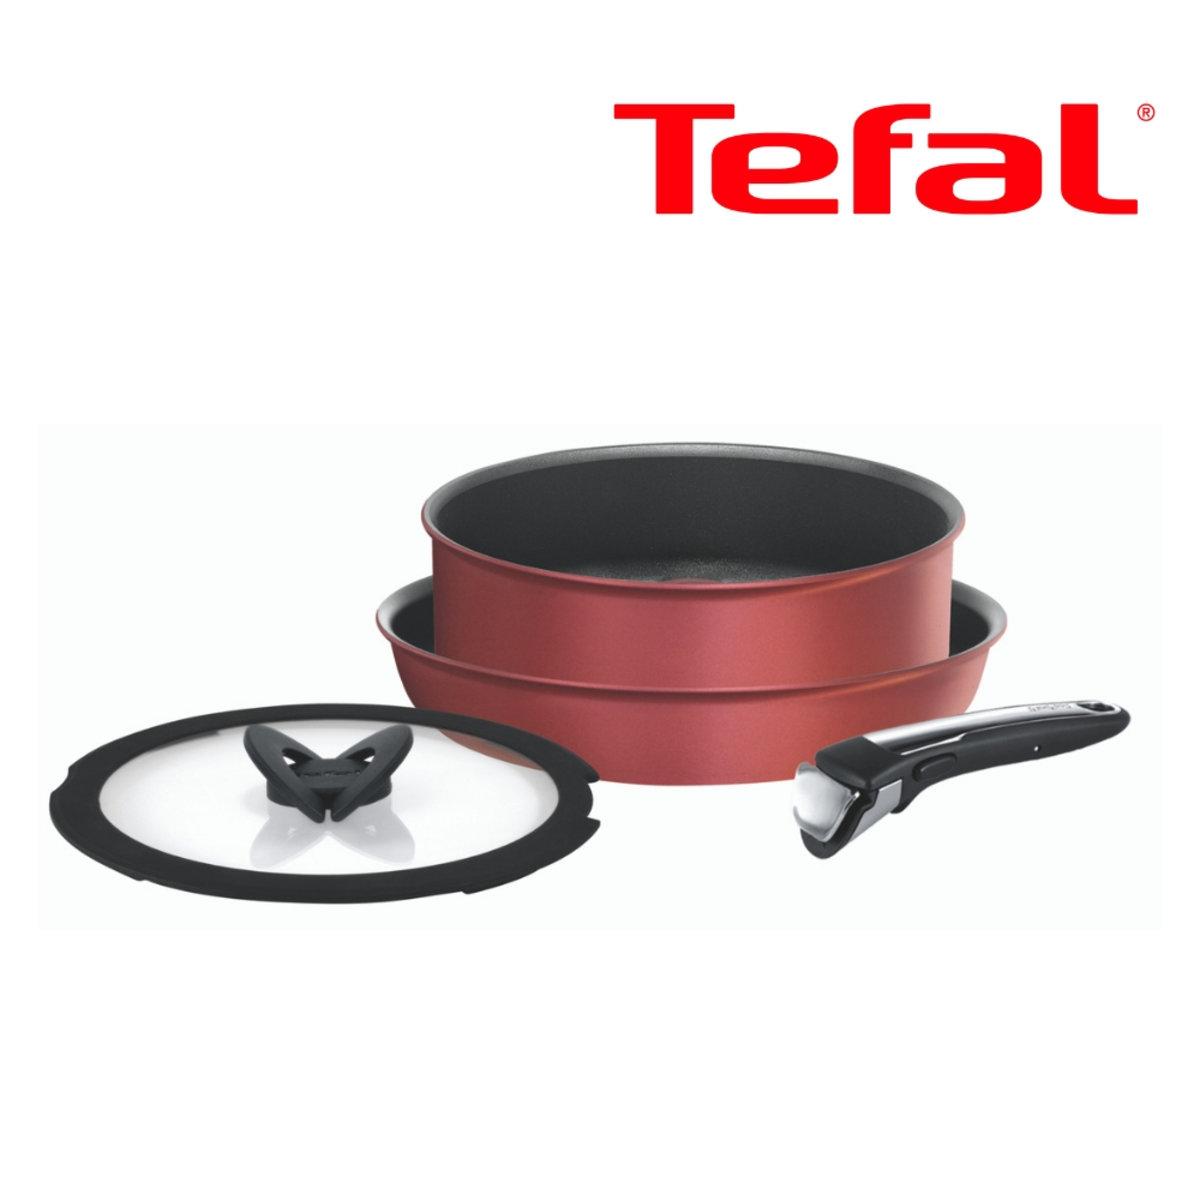 Ingenio 靈巧疊疊鑊易潔廚具4件套裝 L66290